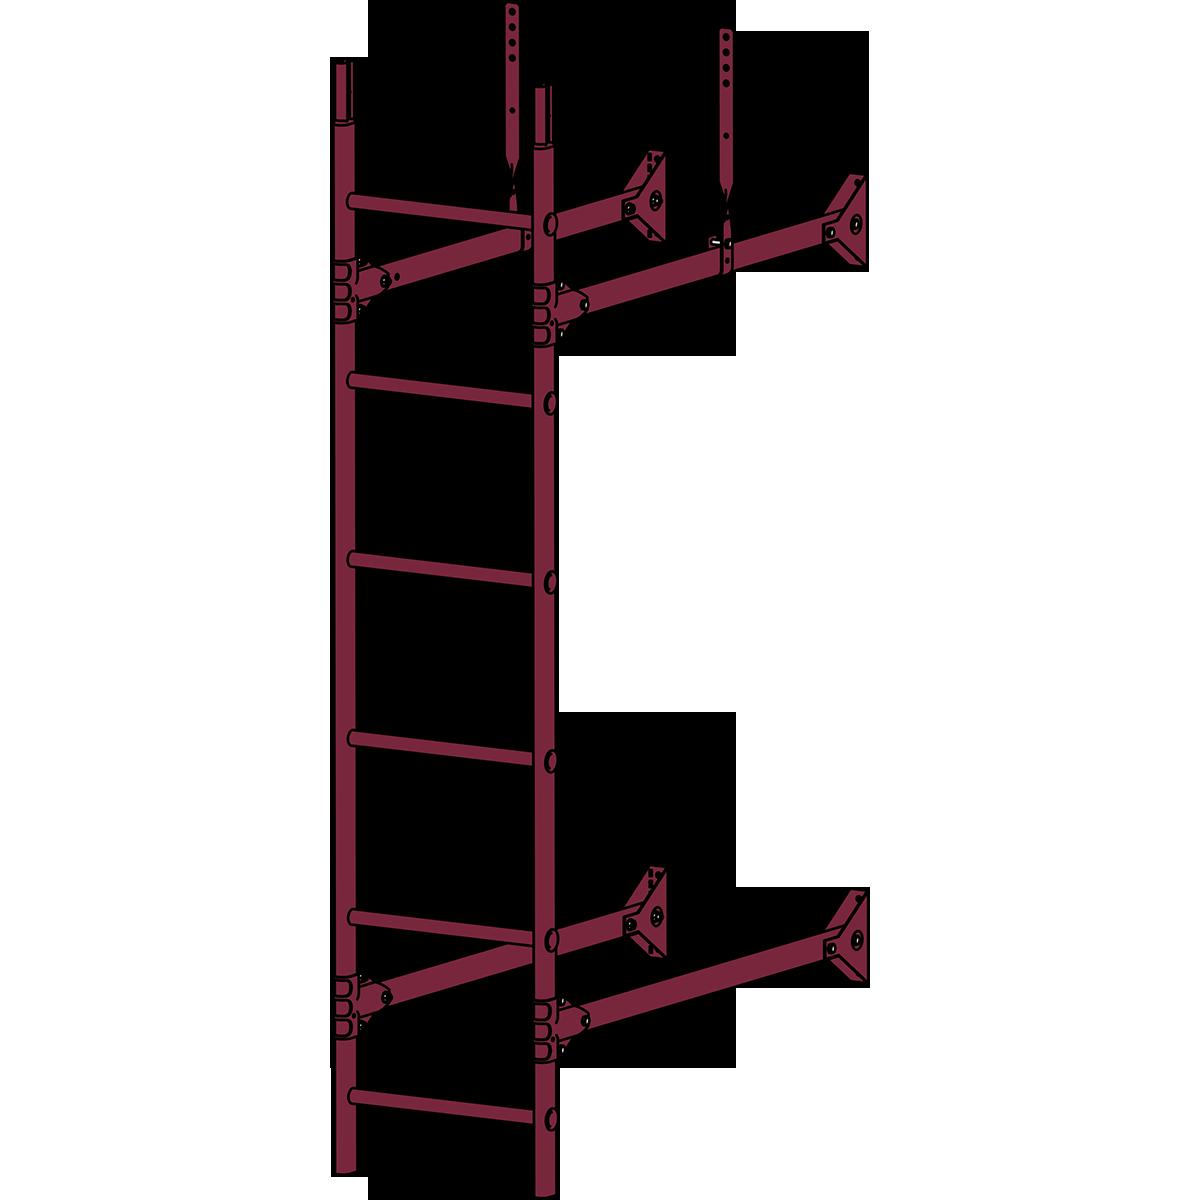 Лестница стеновая ROOFSYSTEMS PRESTIGE ZN 1,2 м RAL 3005 Красное вино